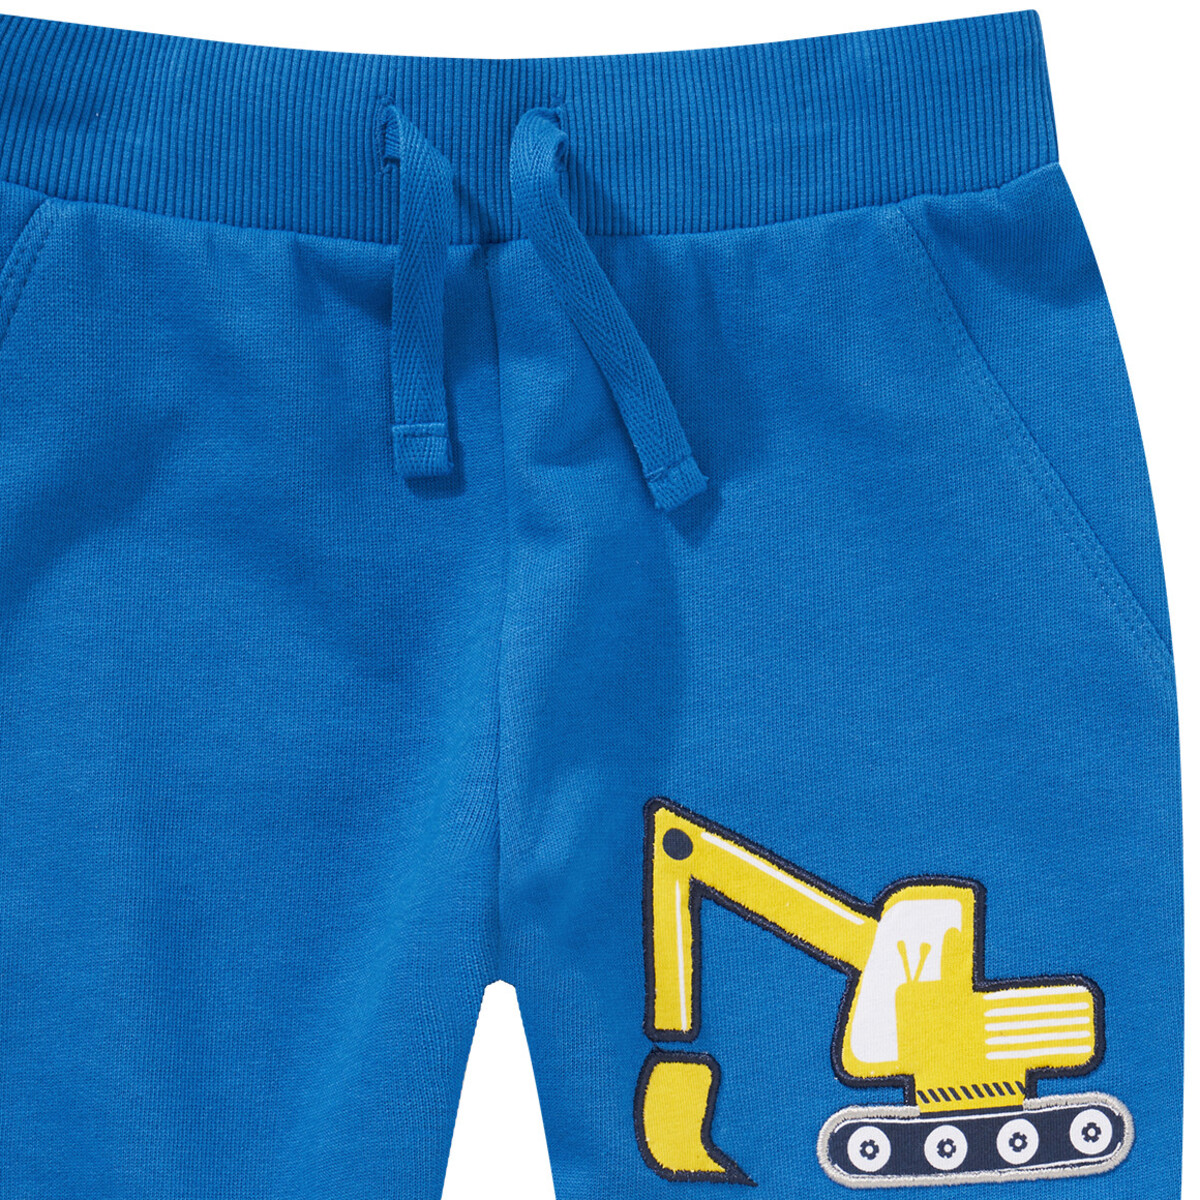 Bild 2 von Jungen Jogginghose mit Bagger-Applikation